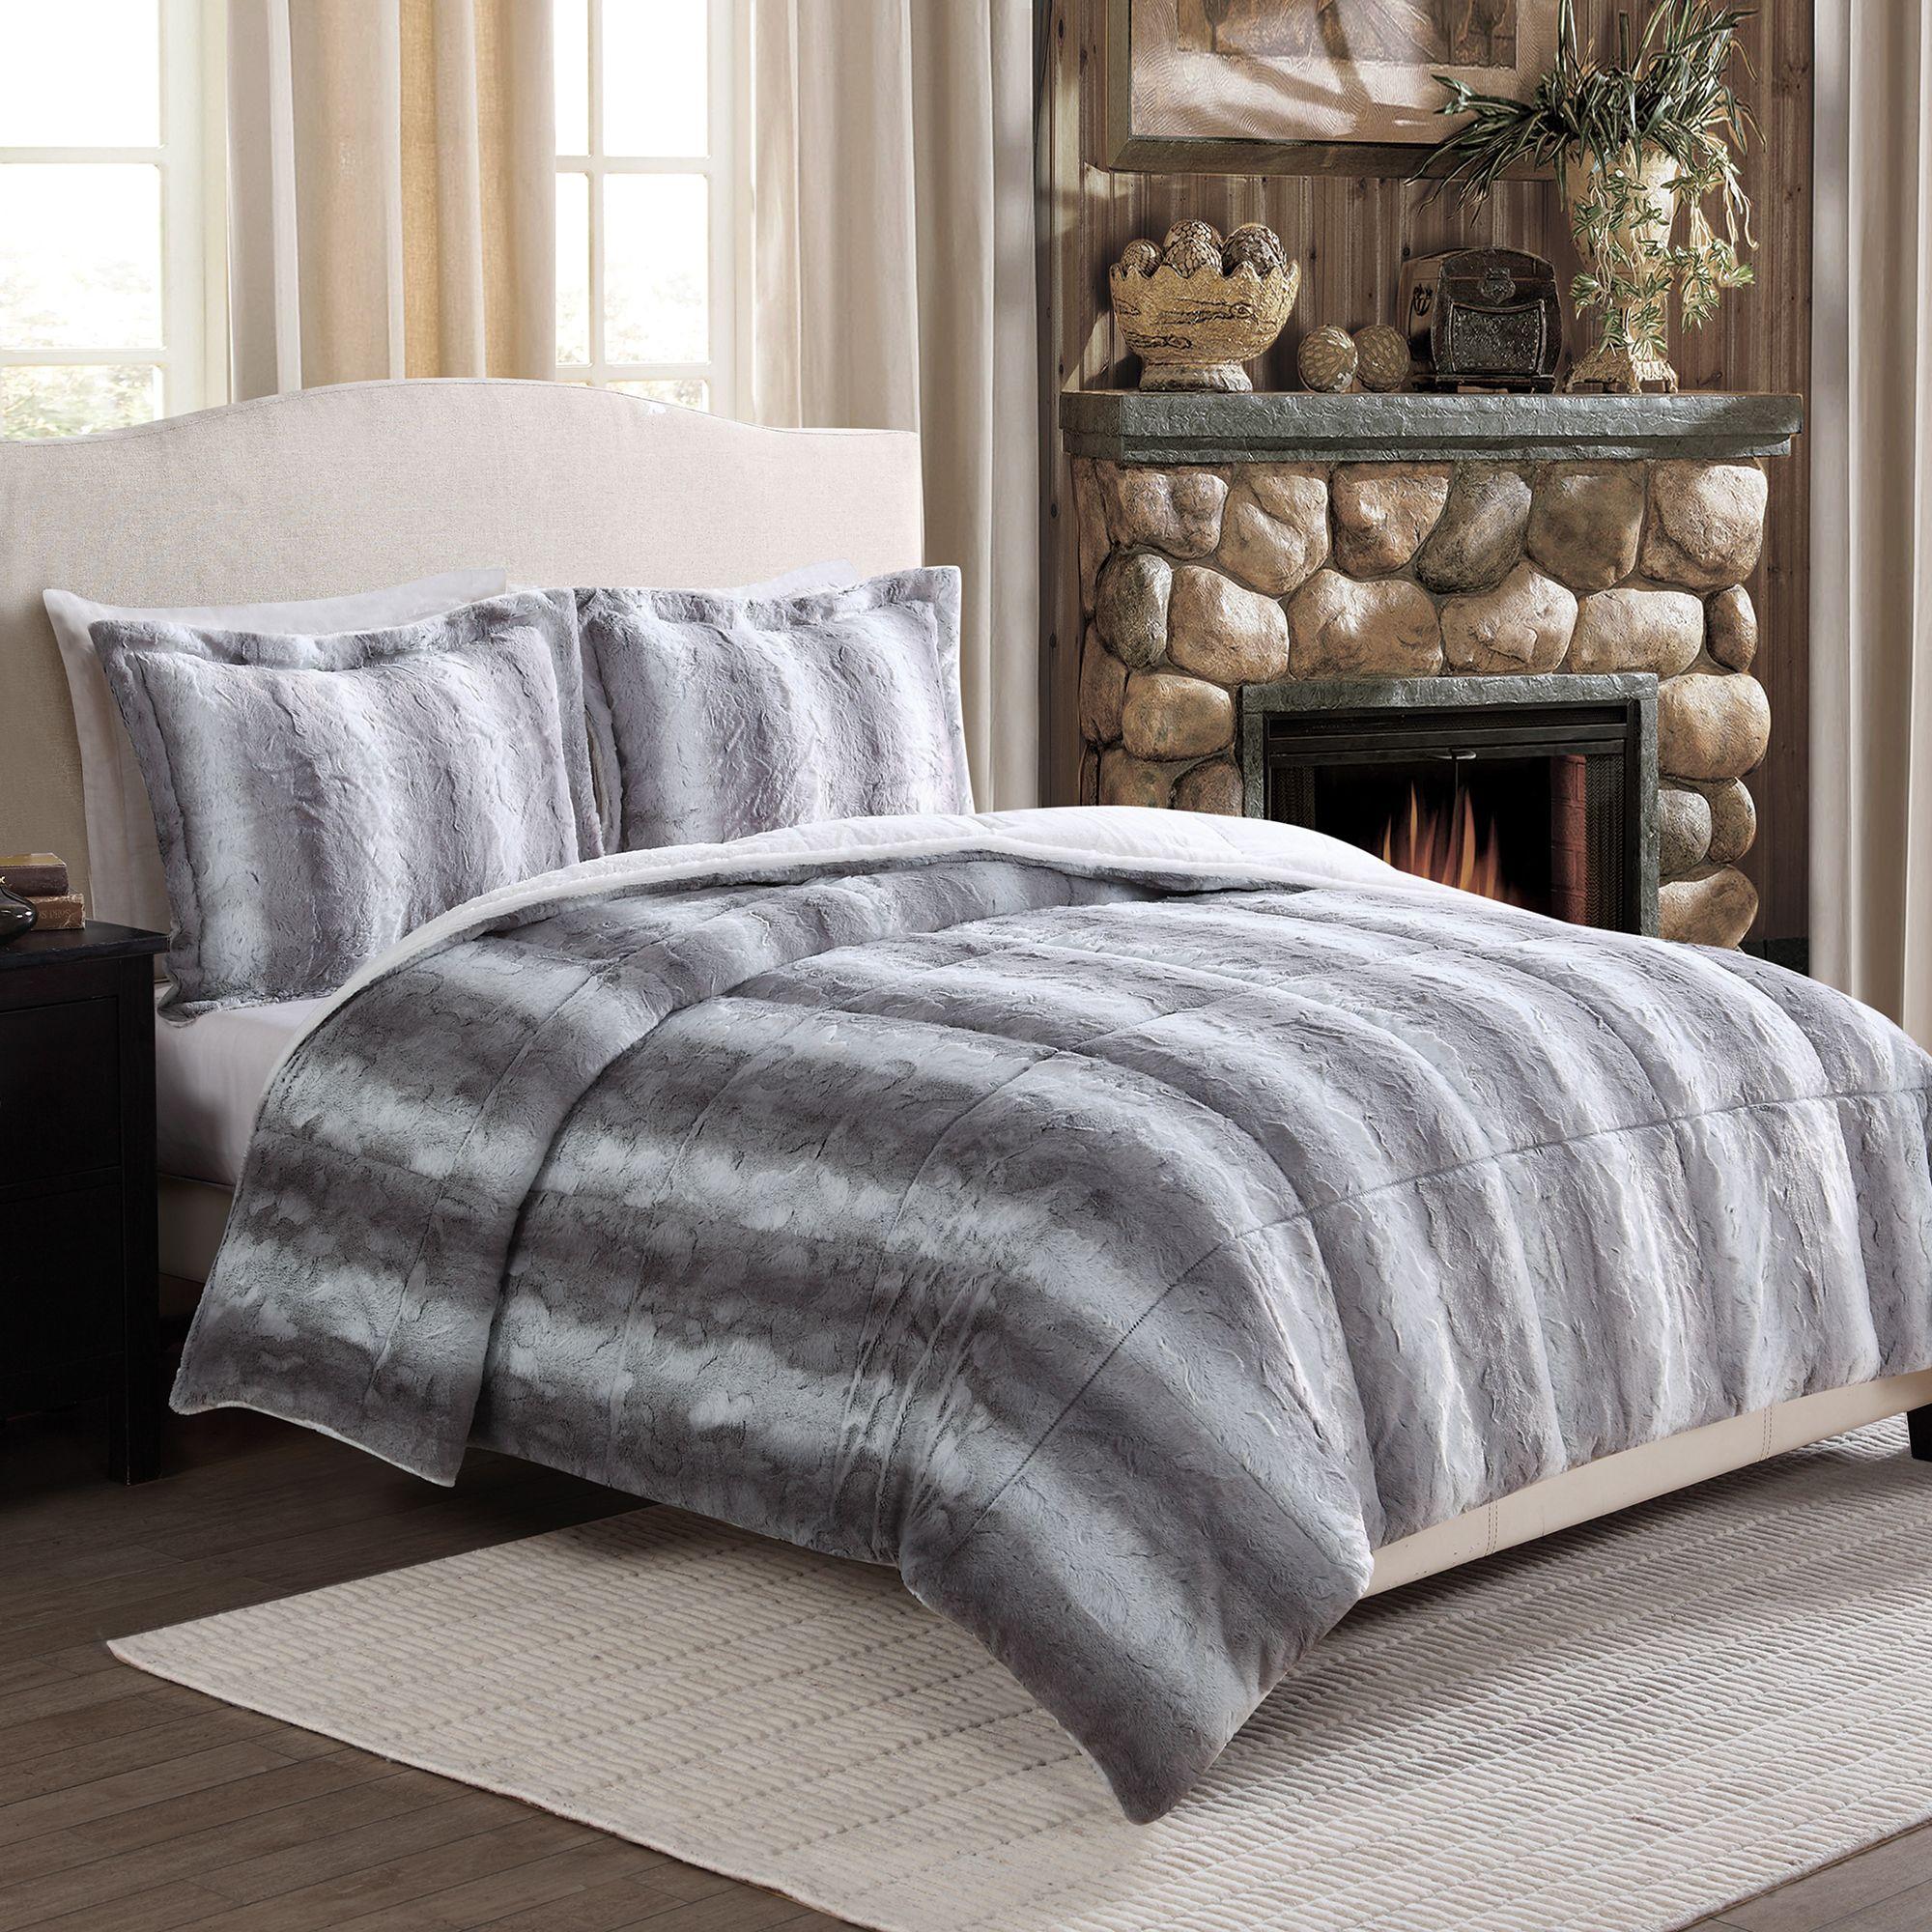 Chinchilla Fashion Fur Reversible Full/Queen Comforter Set in Grey